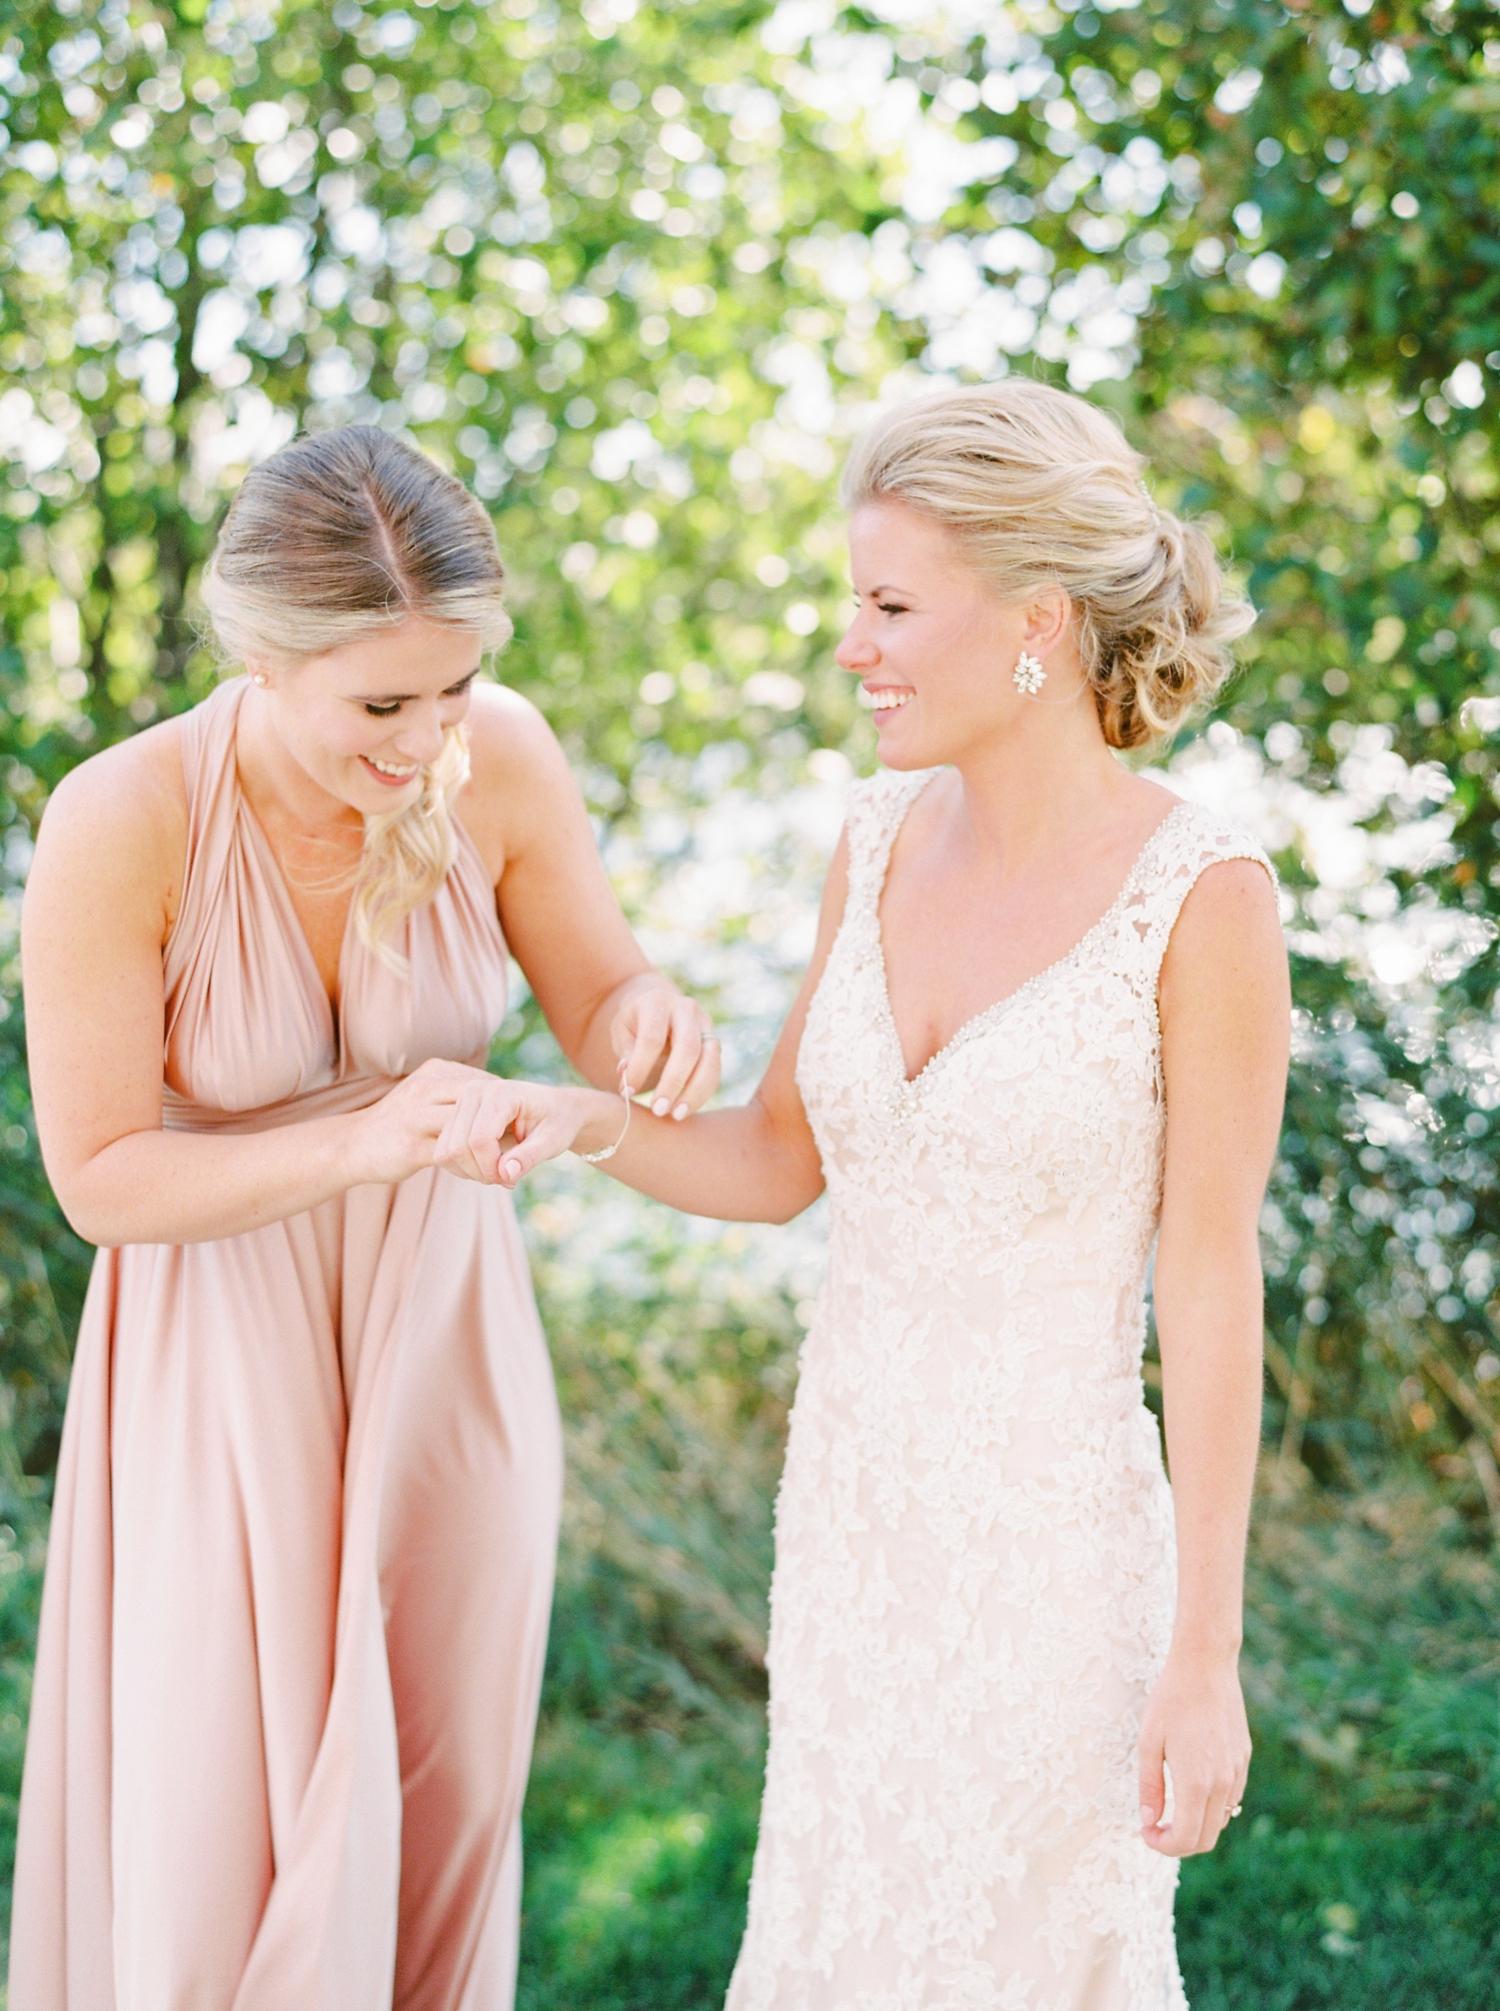 Calgary wedding photographers | oregon wedding photographers | fine art film | Justine Milton Photography | oregon wedding | bride getting redding | bride portraits